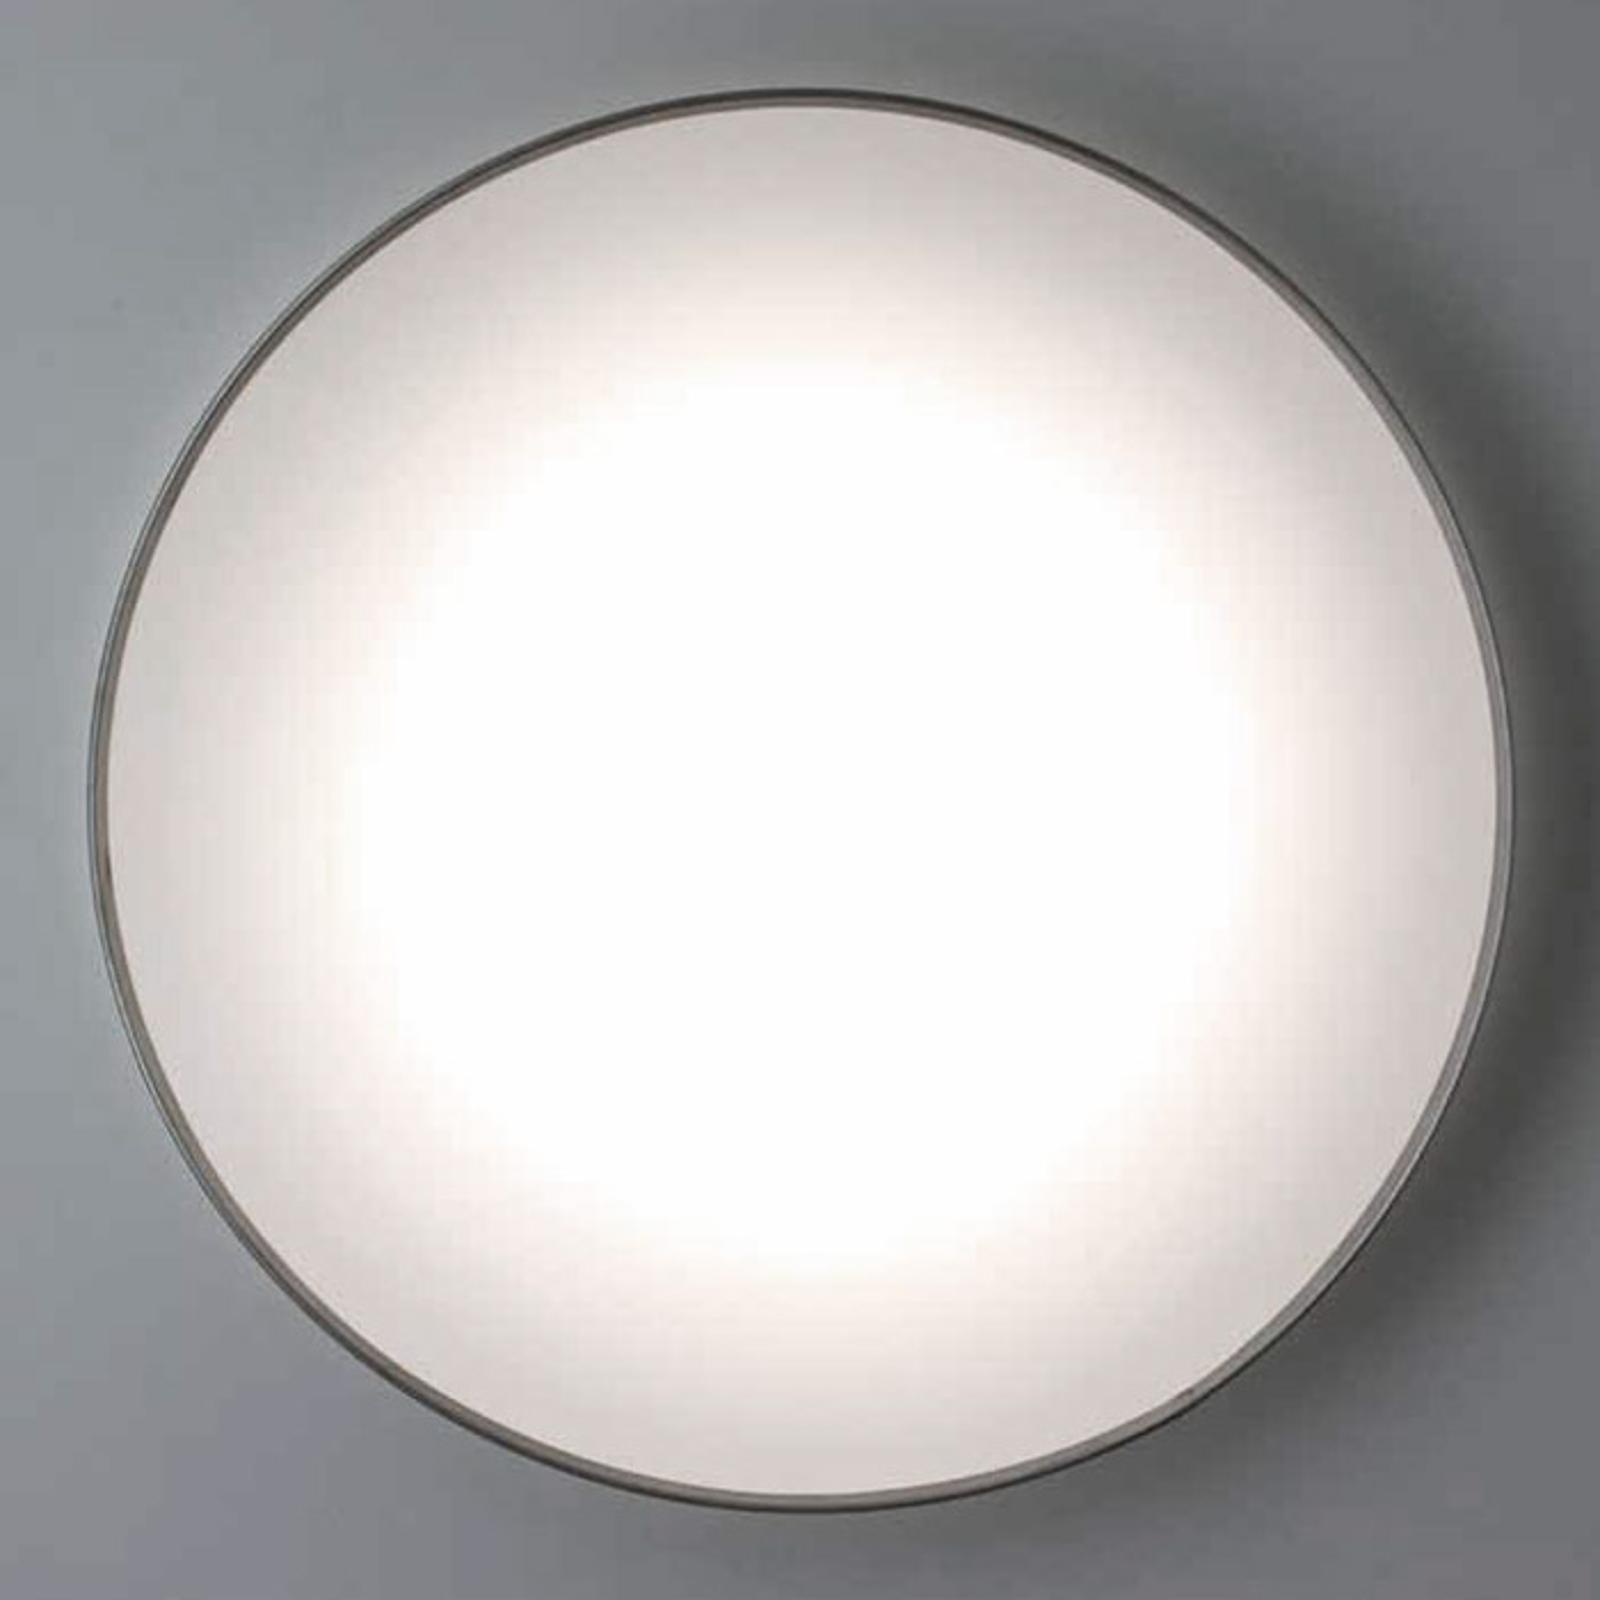 SUN 4 LED loftlampe i rustfrit stål 8 W 4K